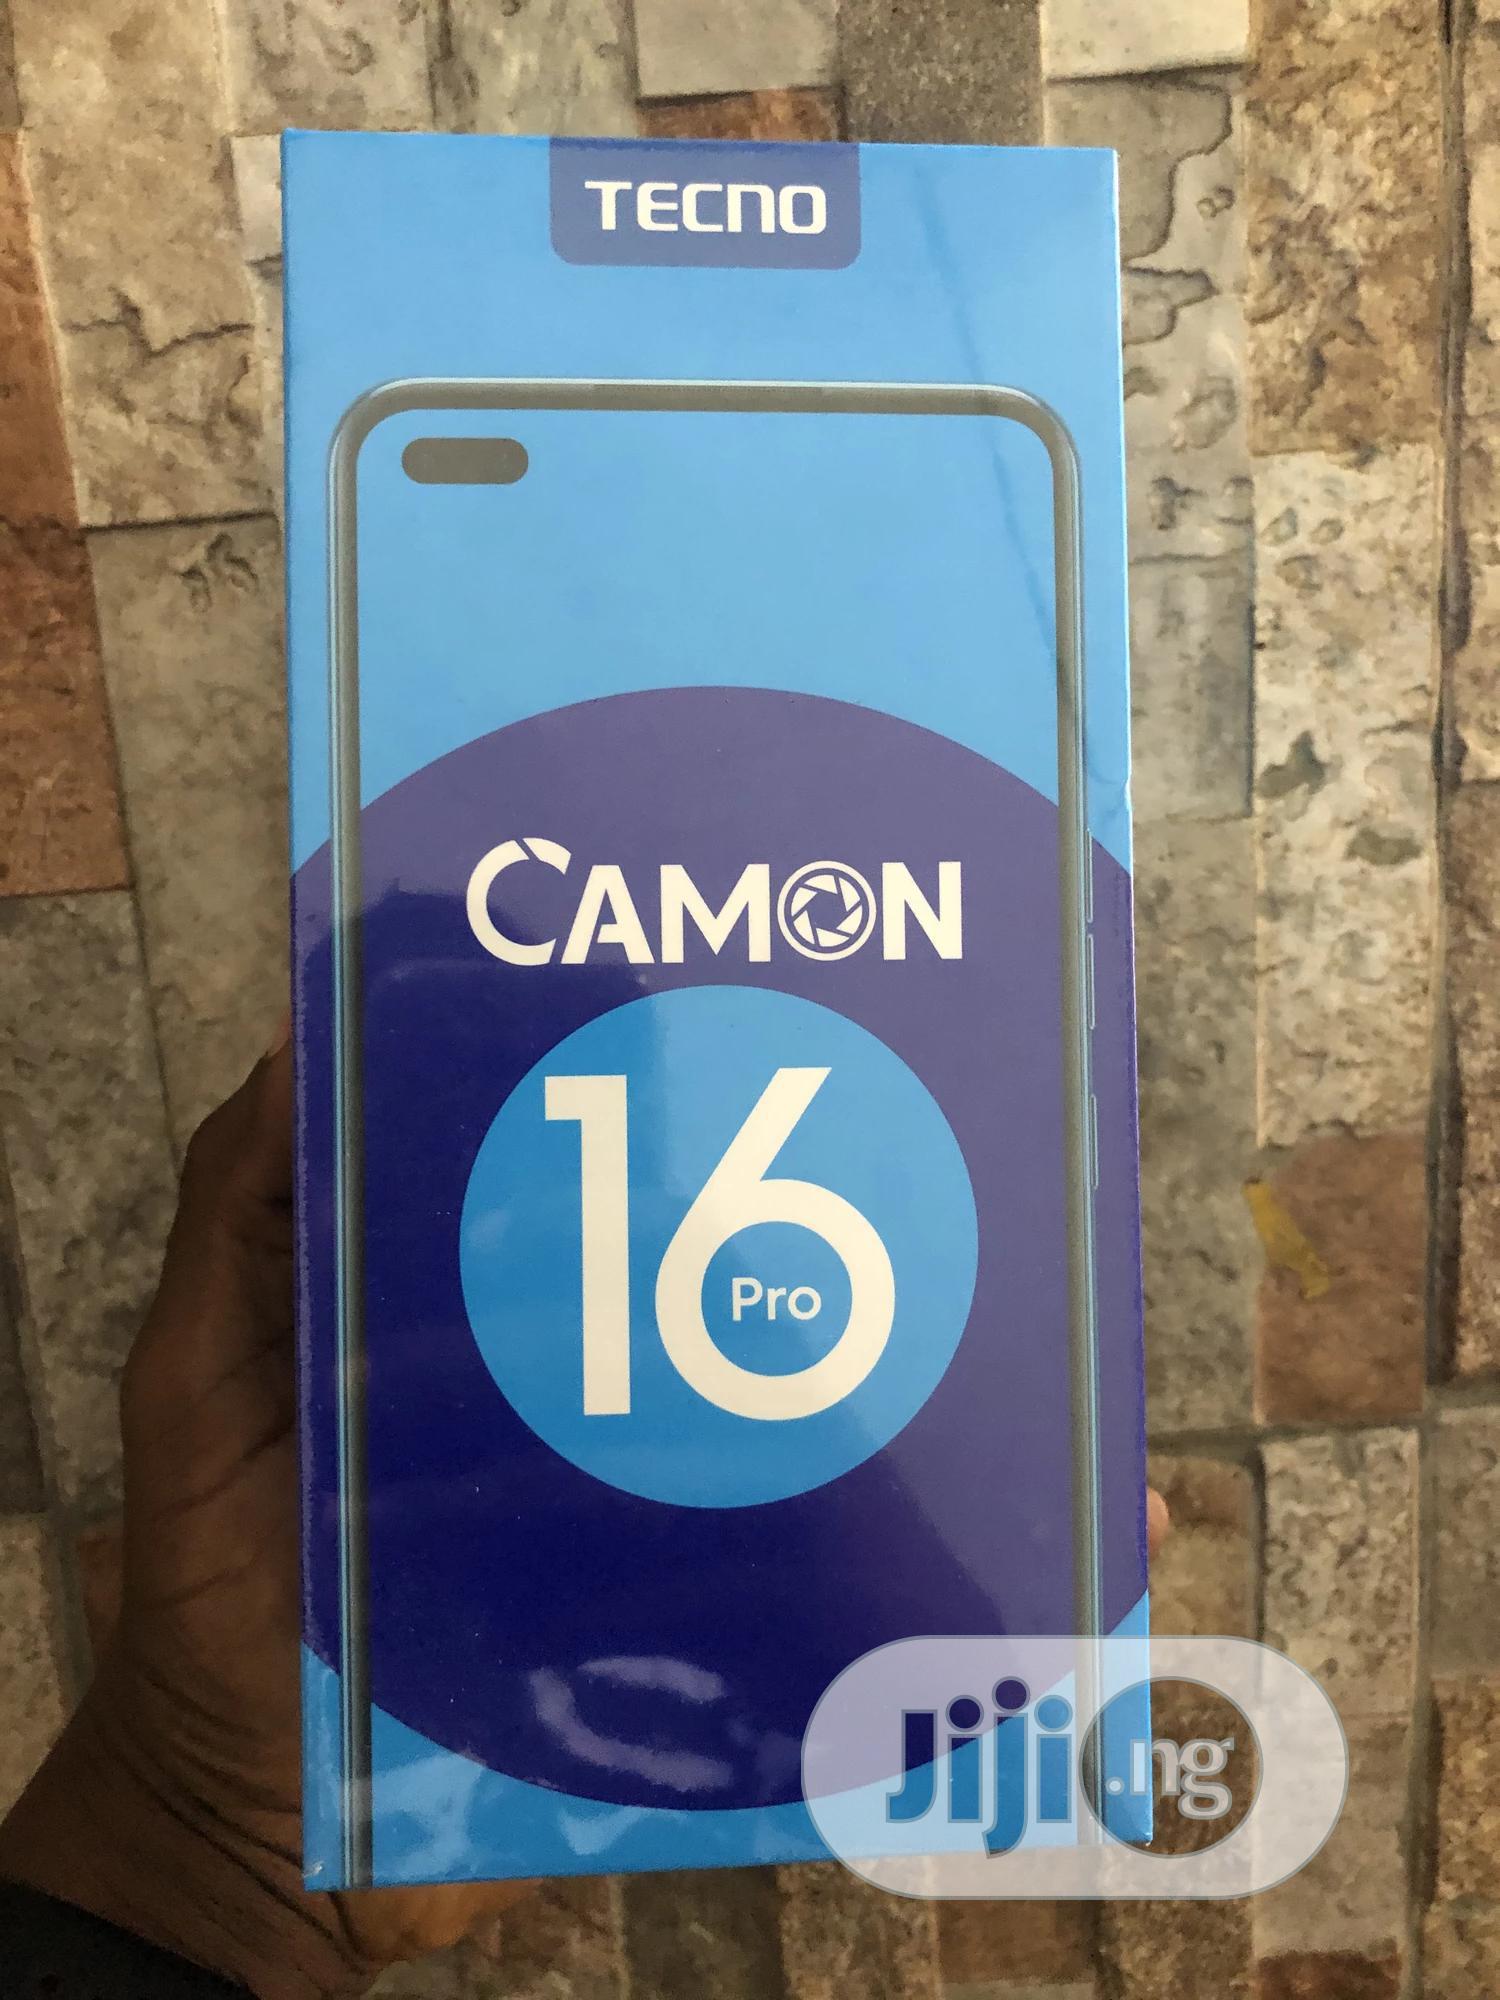 New Tecno Camon 16 Pro 128 GB